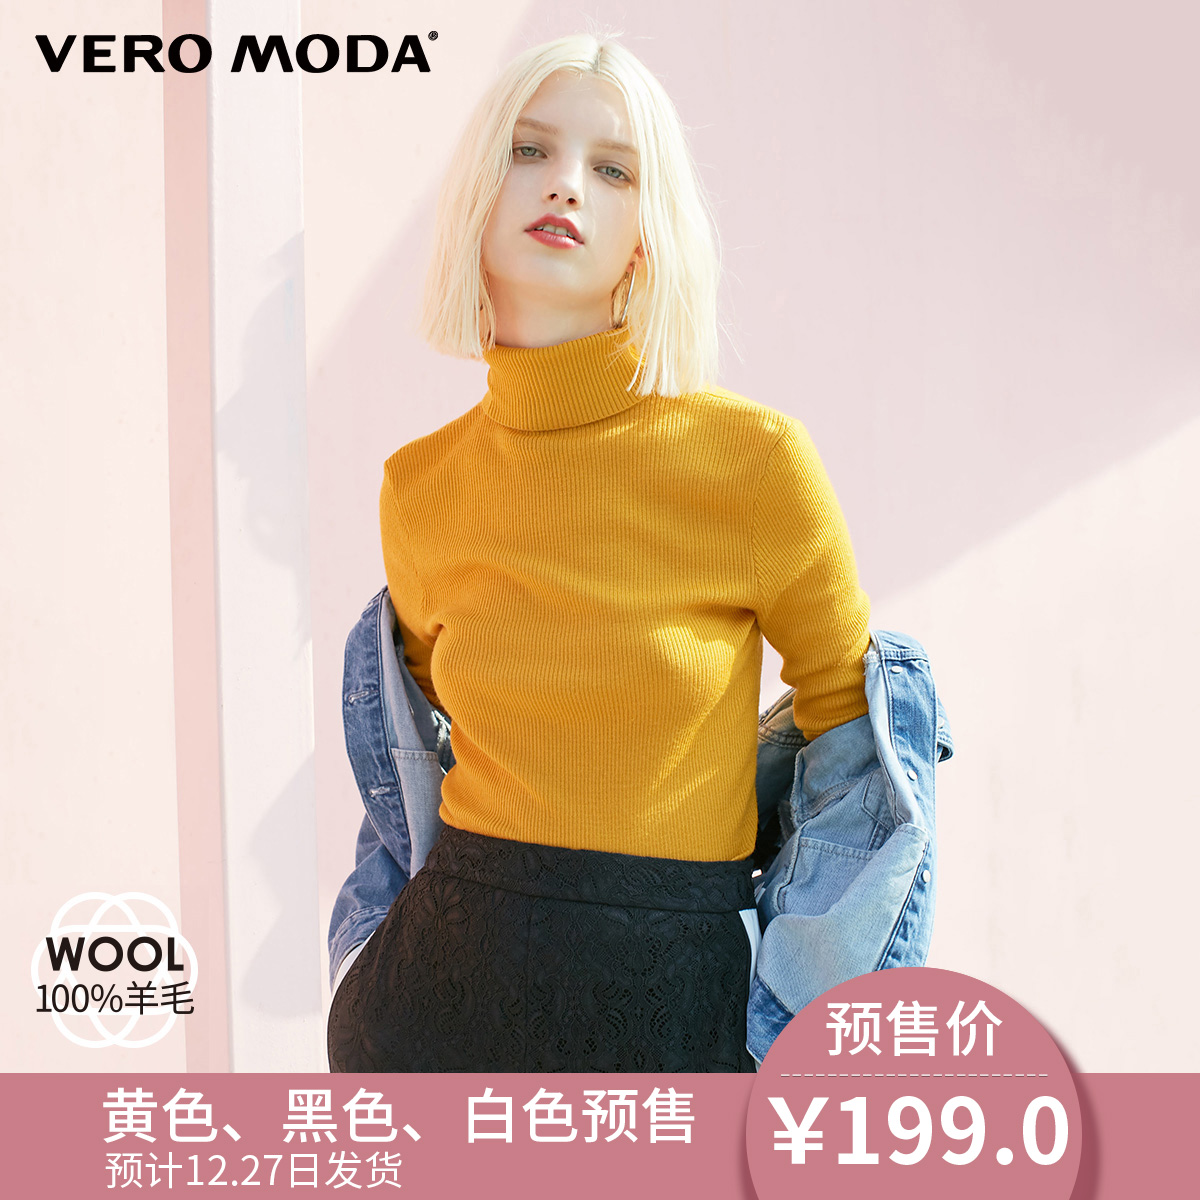 Vero Moda2018秋装新款纯羊毛欧洲站修身毛衣针织衫女|318324522